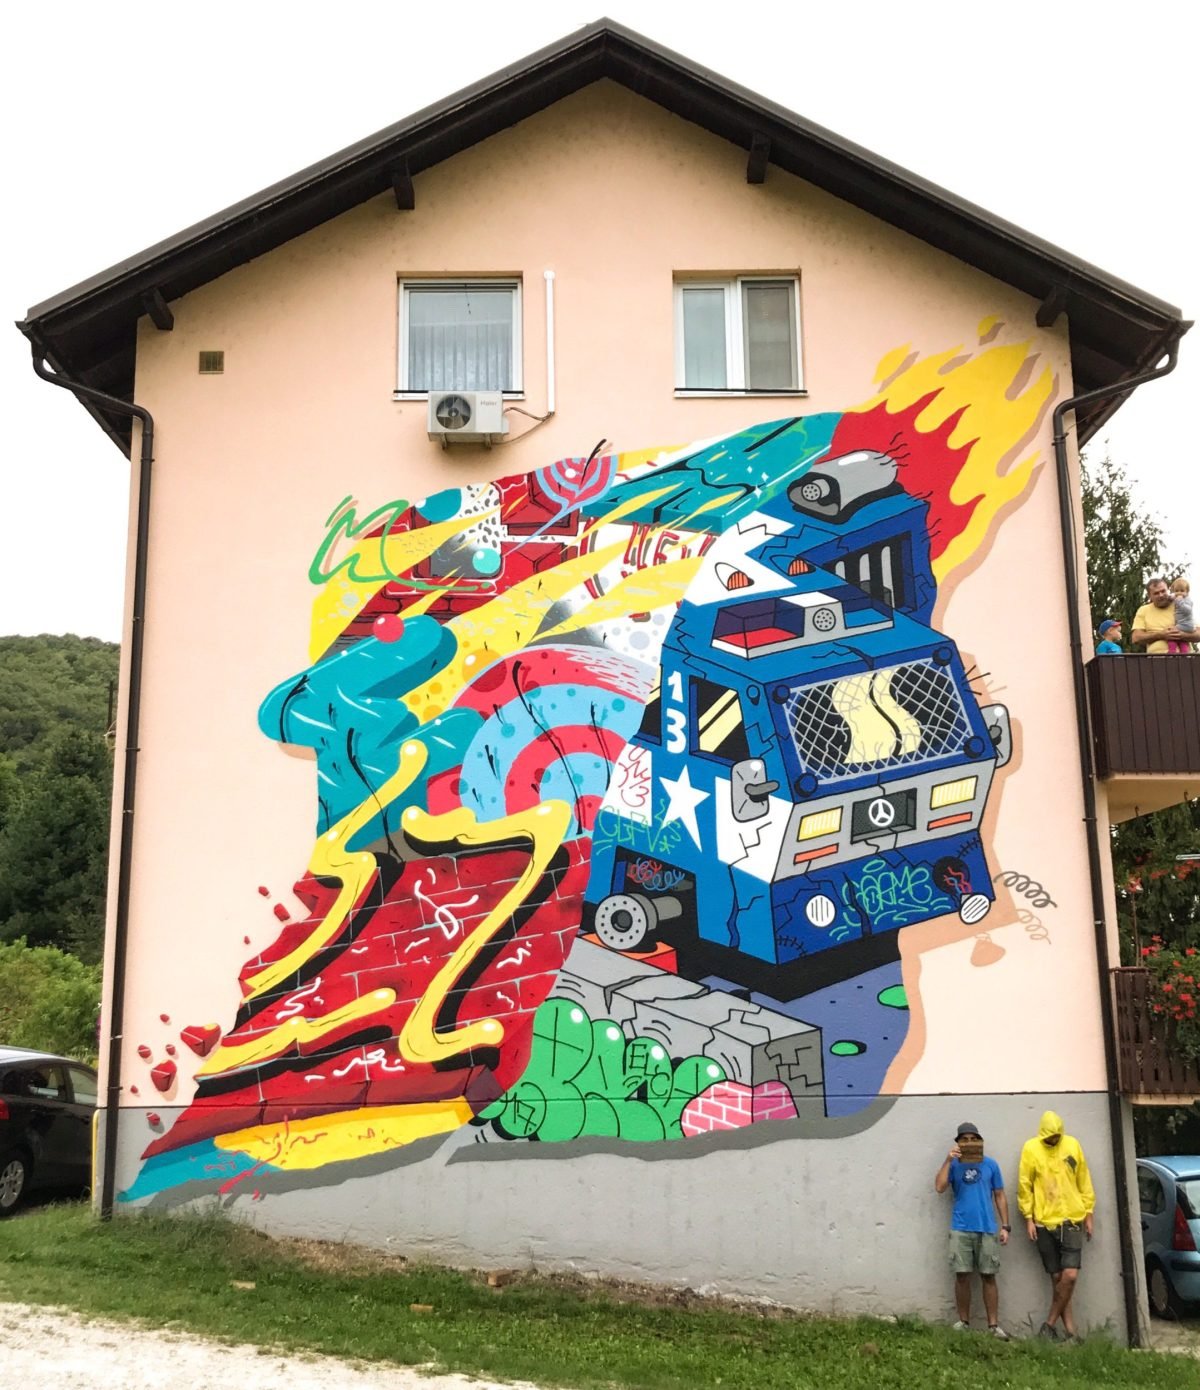 Chez 186 and Sarme mural for Graffiti na Gradele